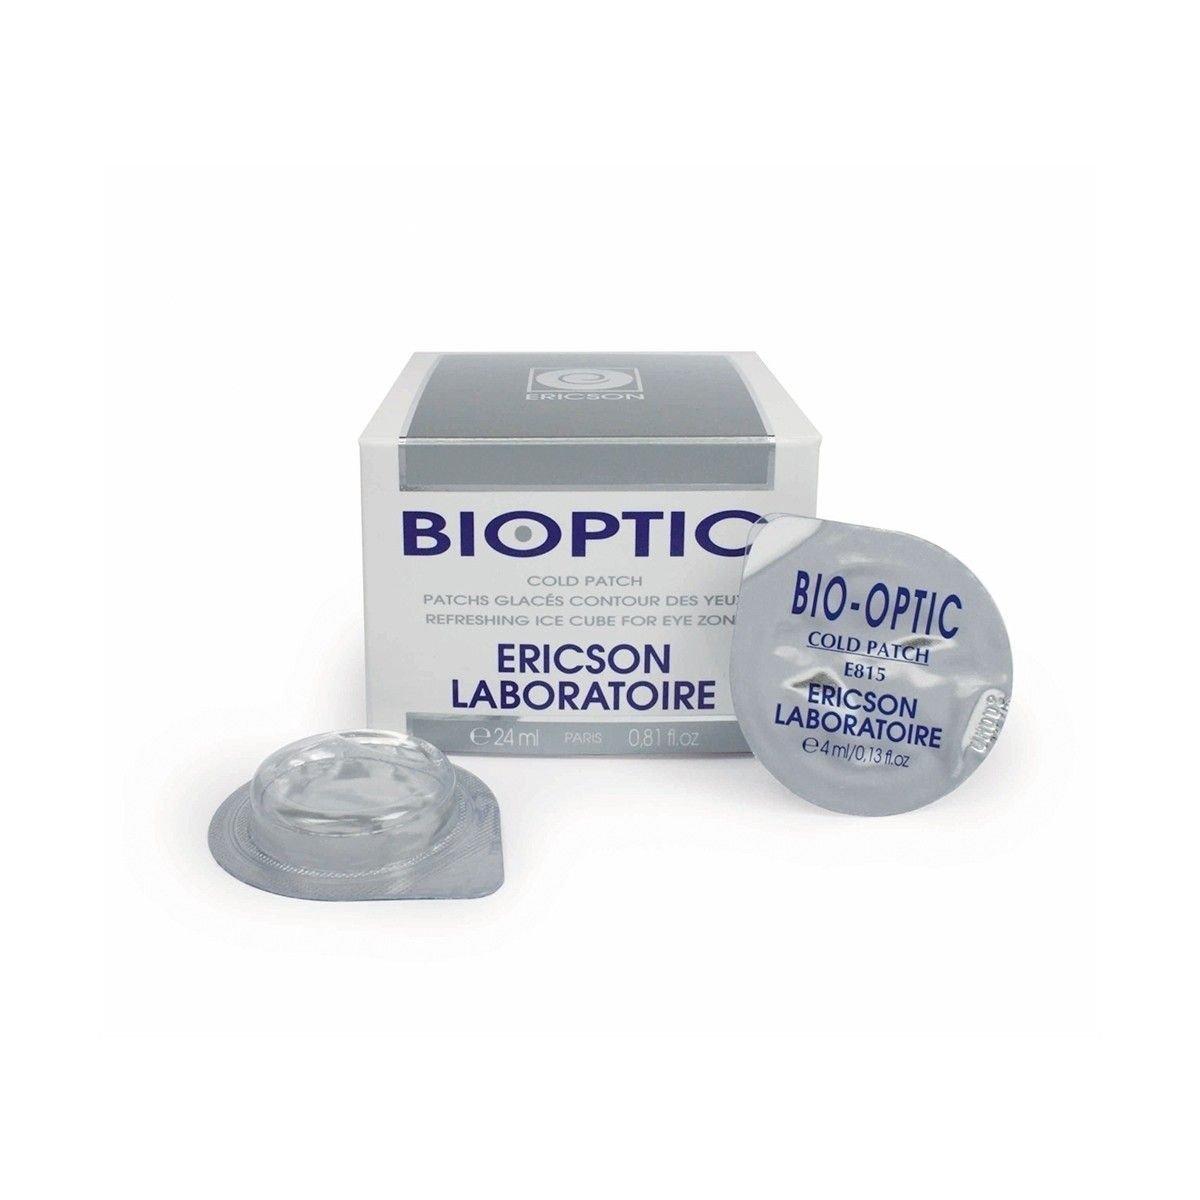 Afbeelding van Ericson Laboratoire Bioptic Cold Patch Complete oogverzorging Beauty